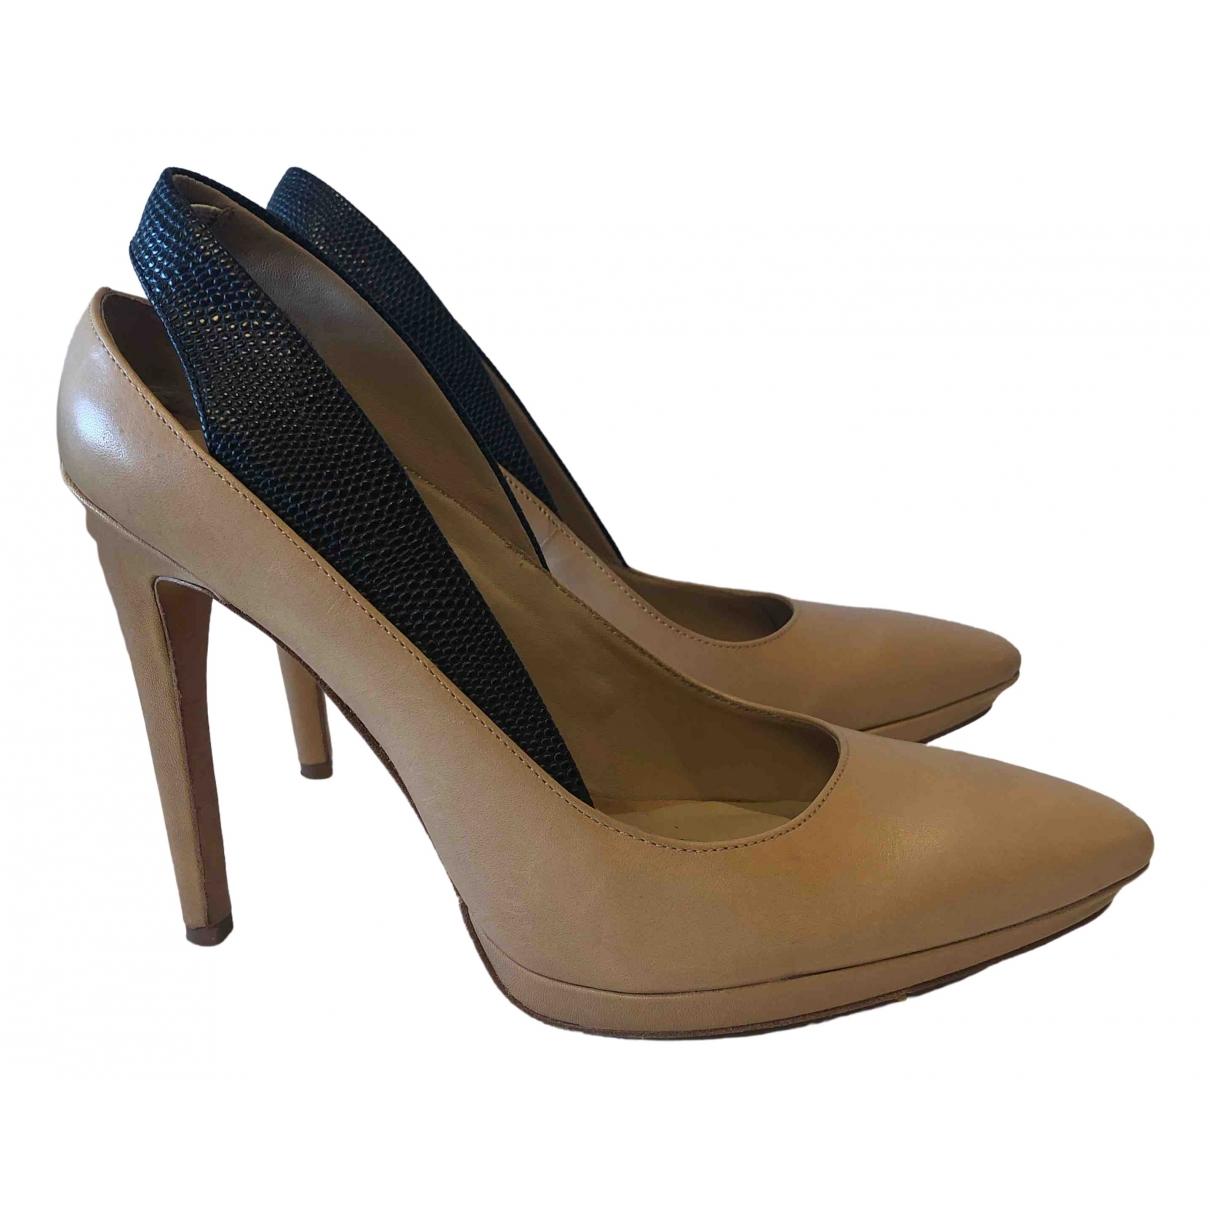 Bcbg Max Azria \N Leather Heels for Women 37.5 EU